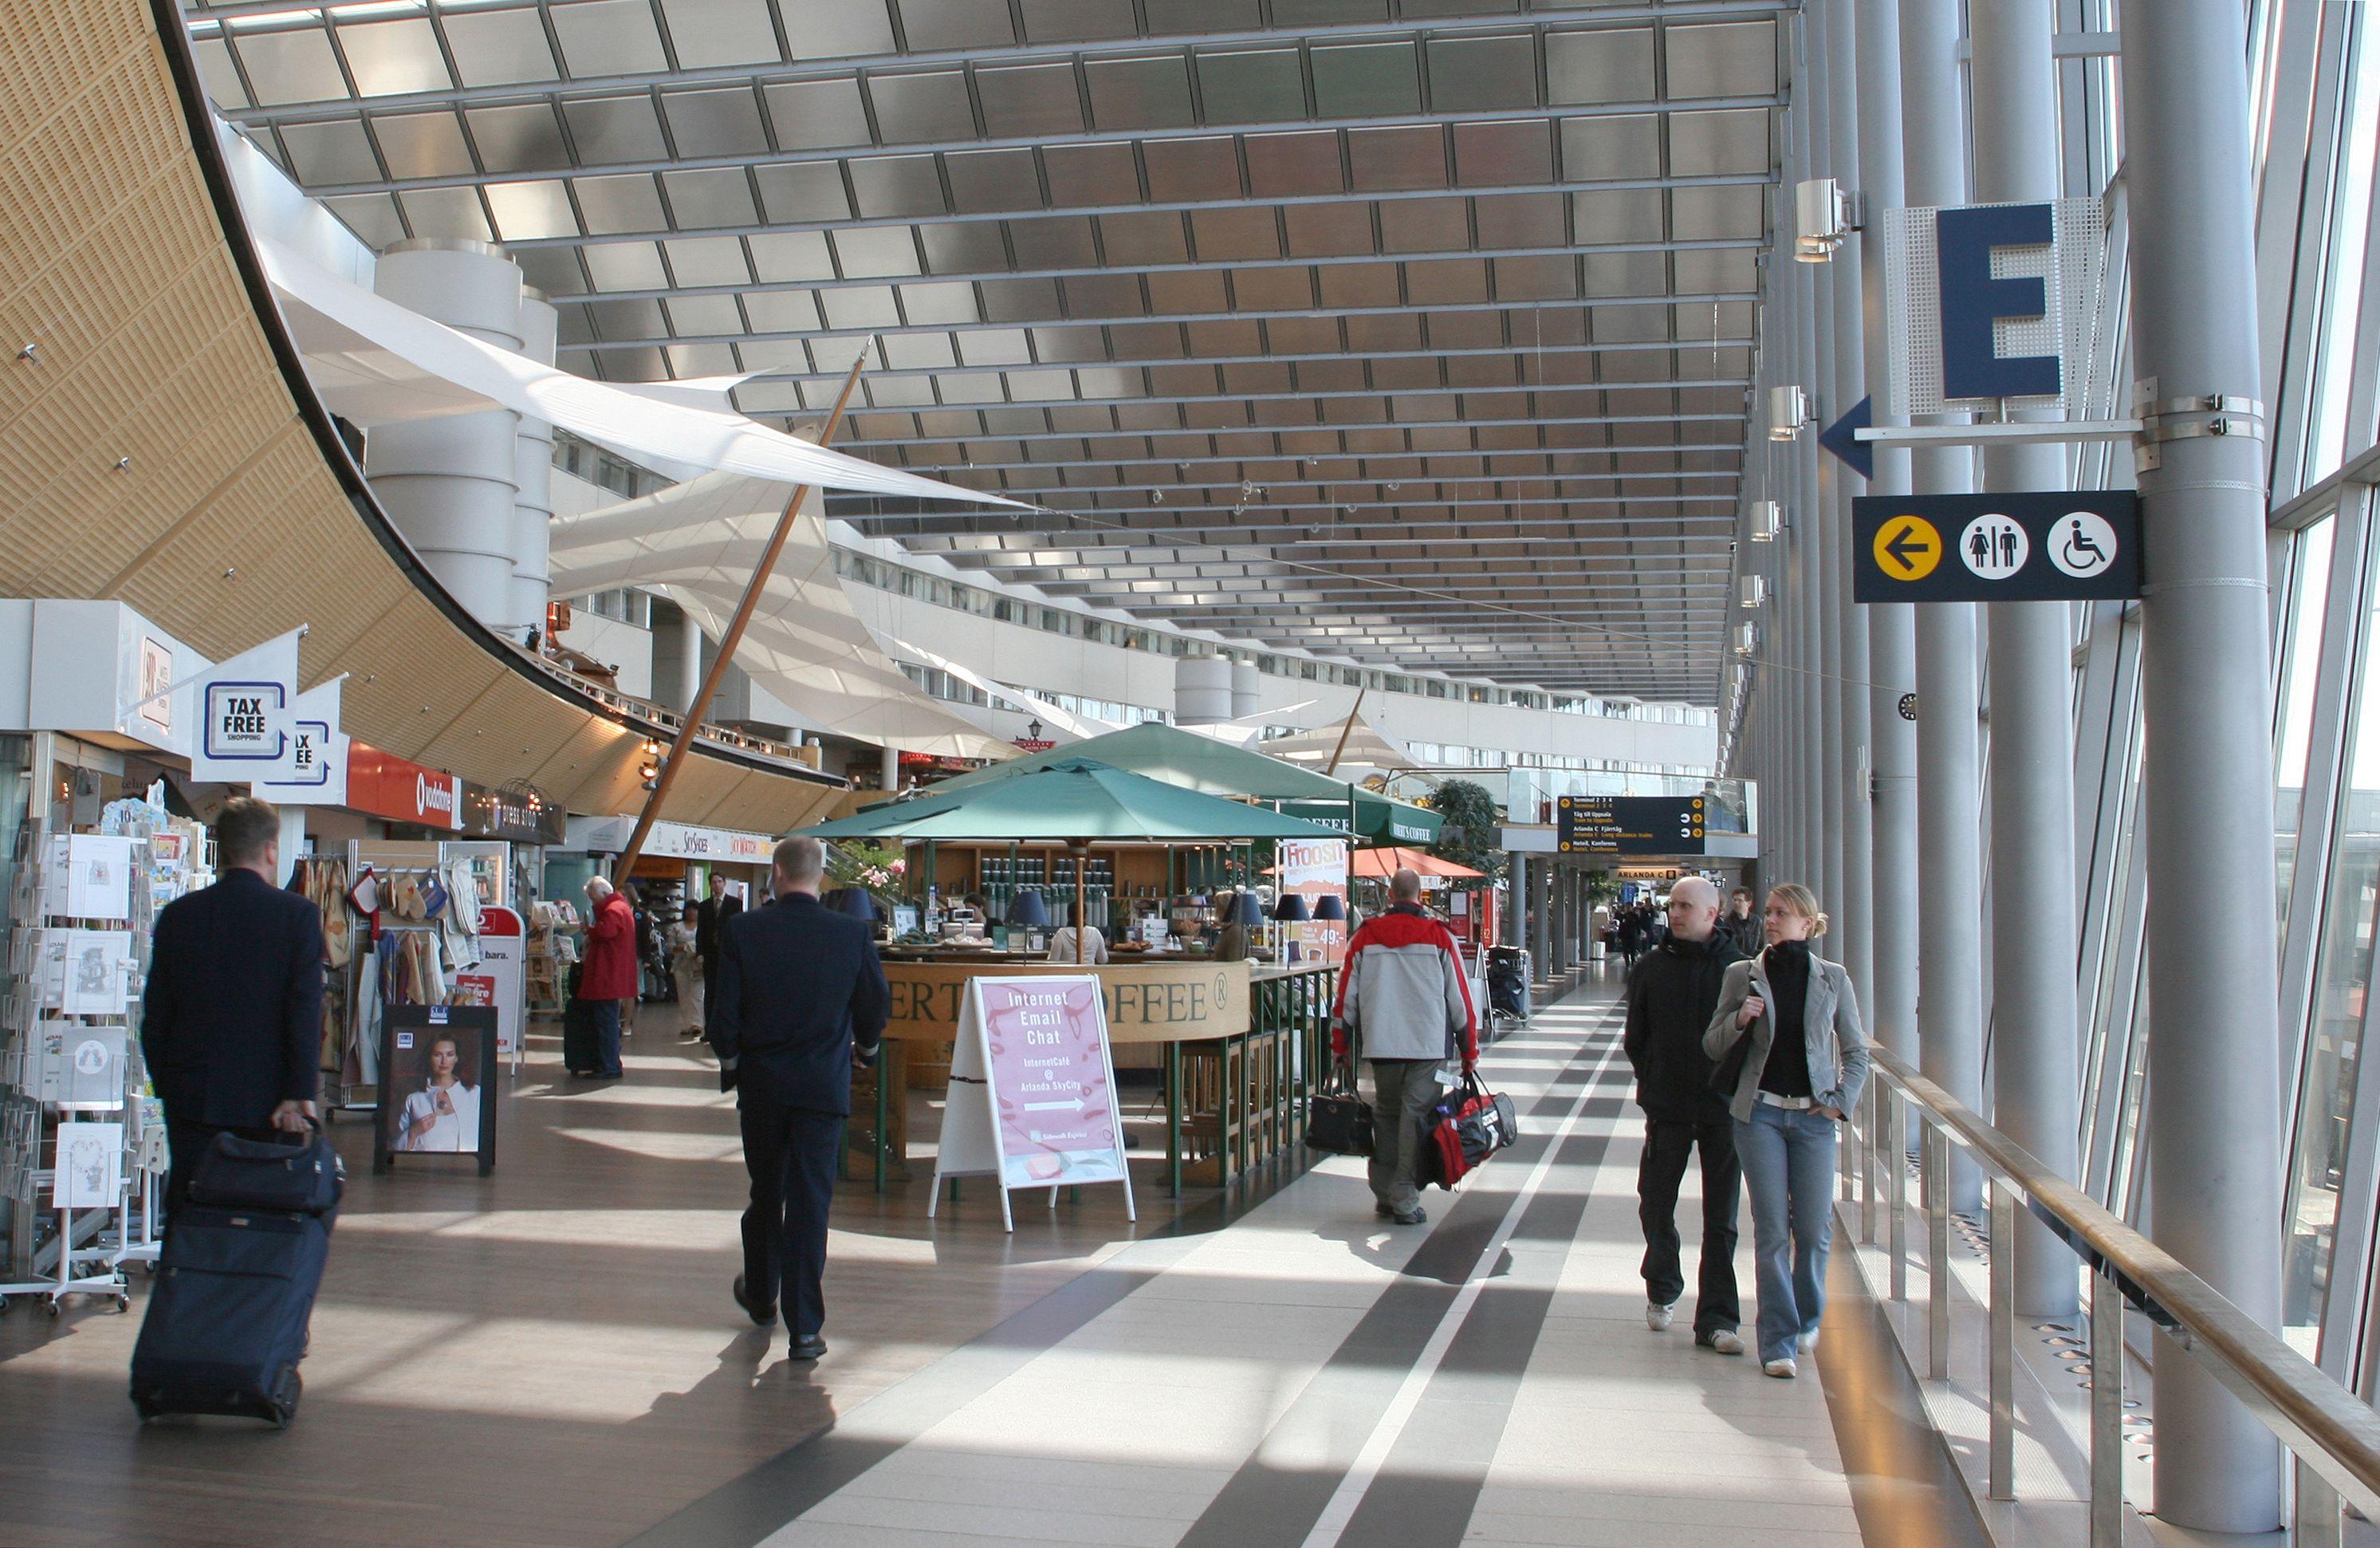 Arlanda airport signage google search stockholm for Hotels near arlanda airport sweden